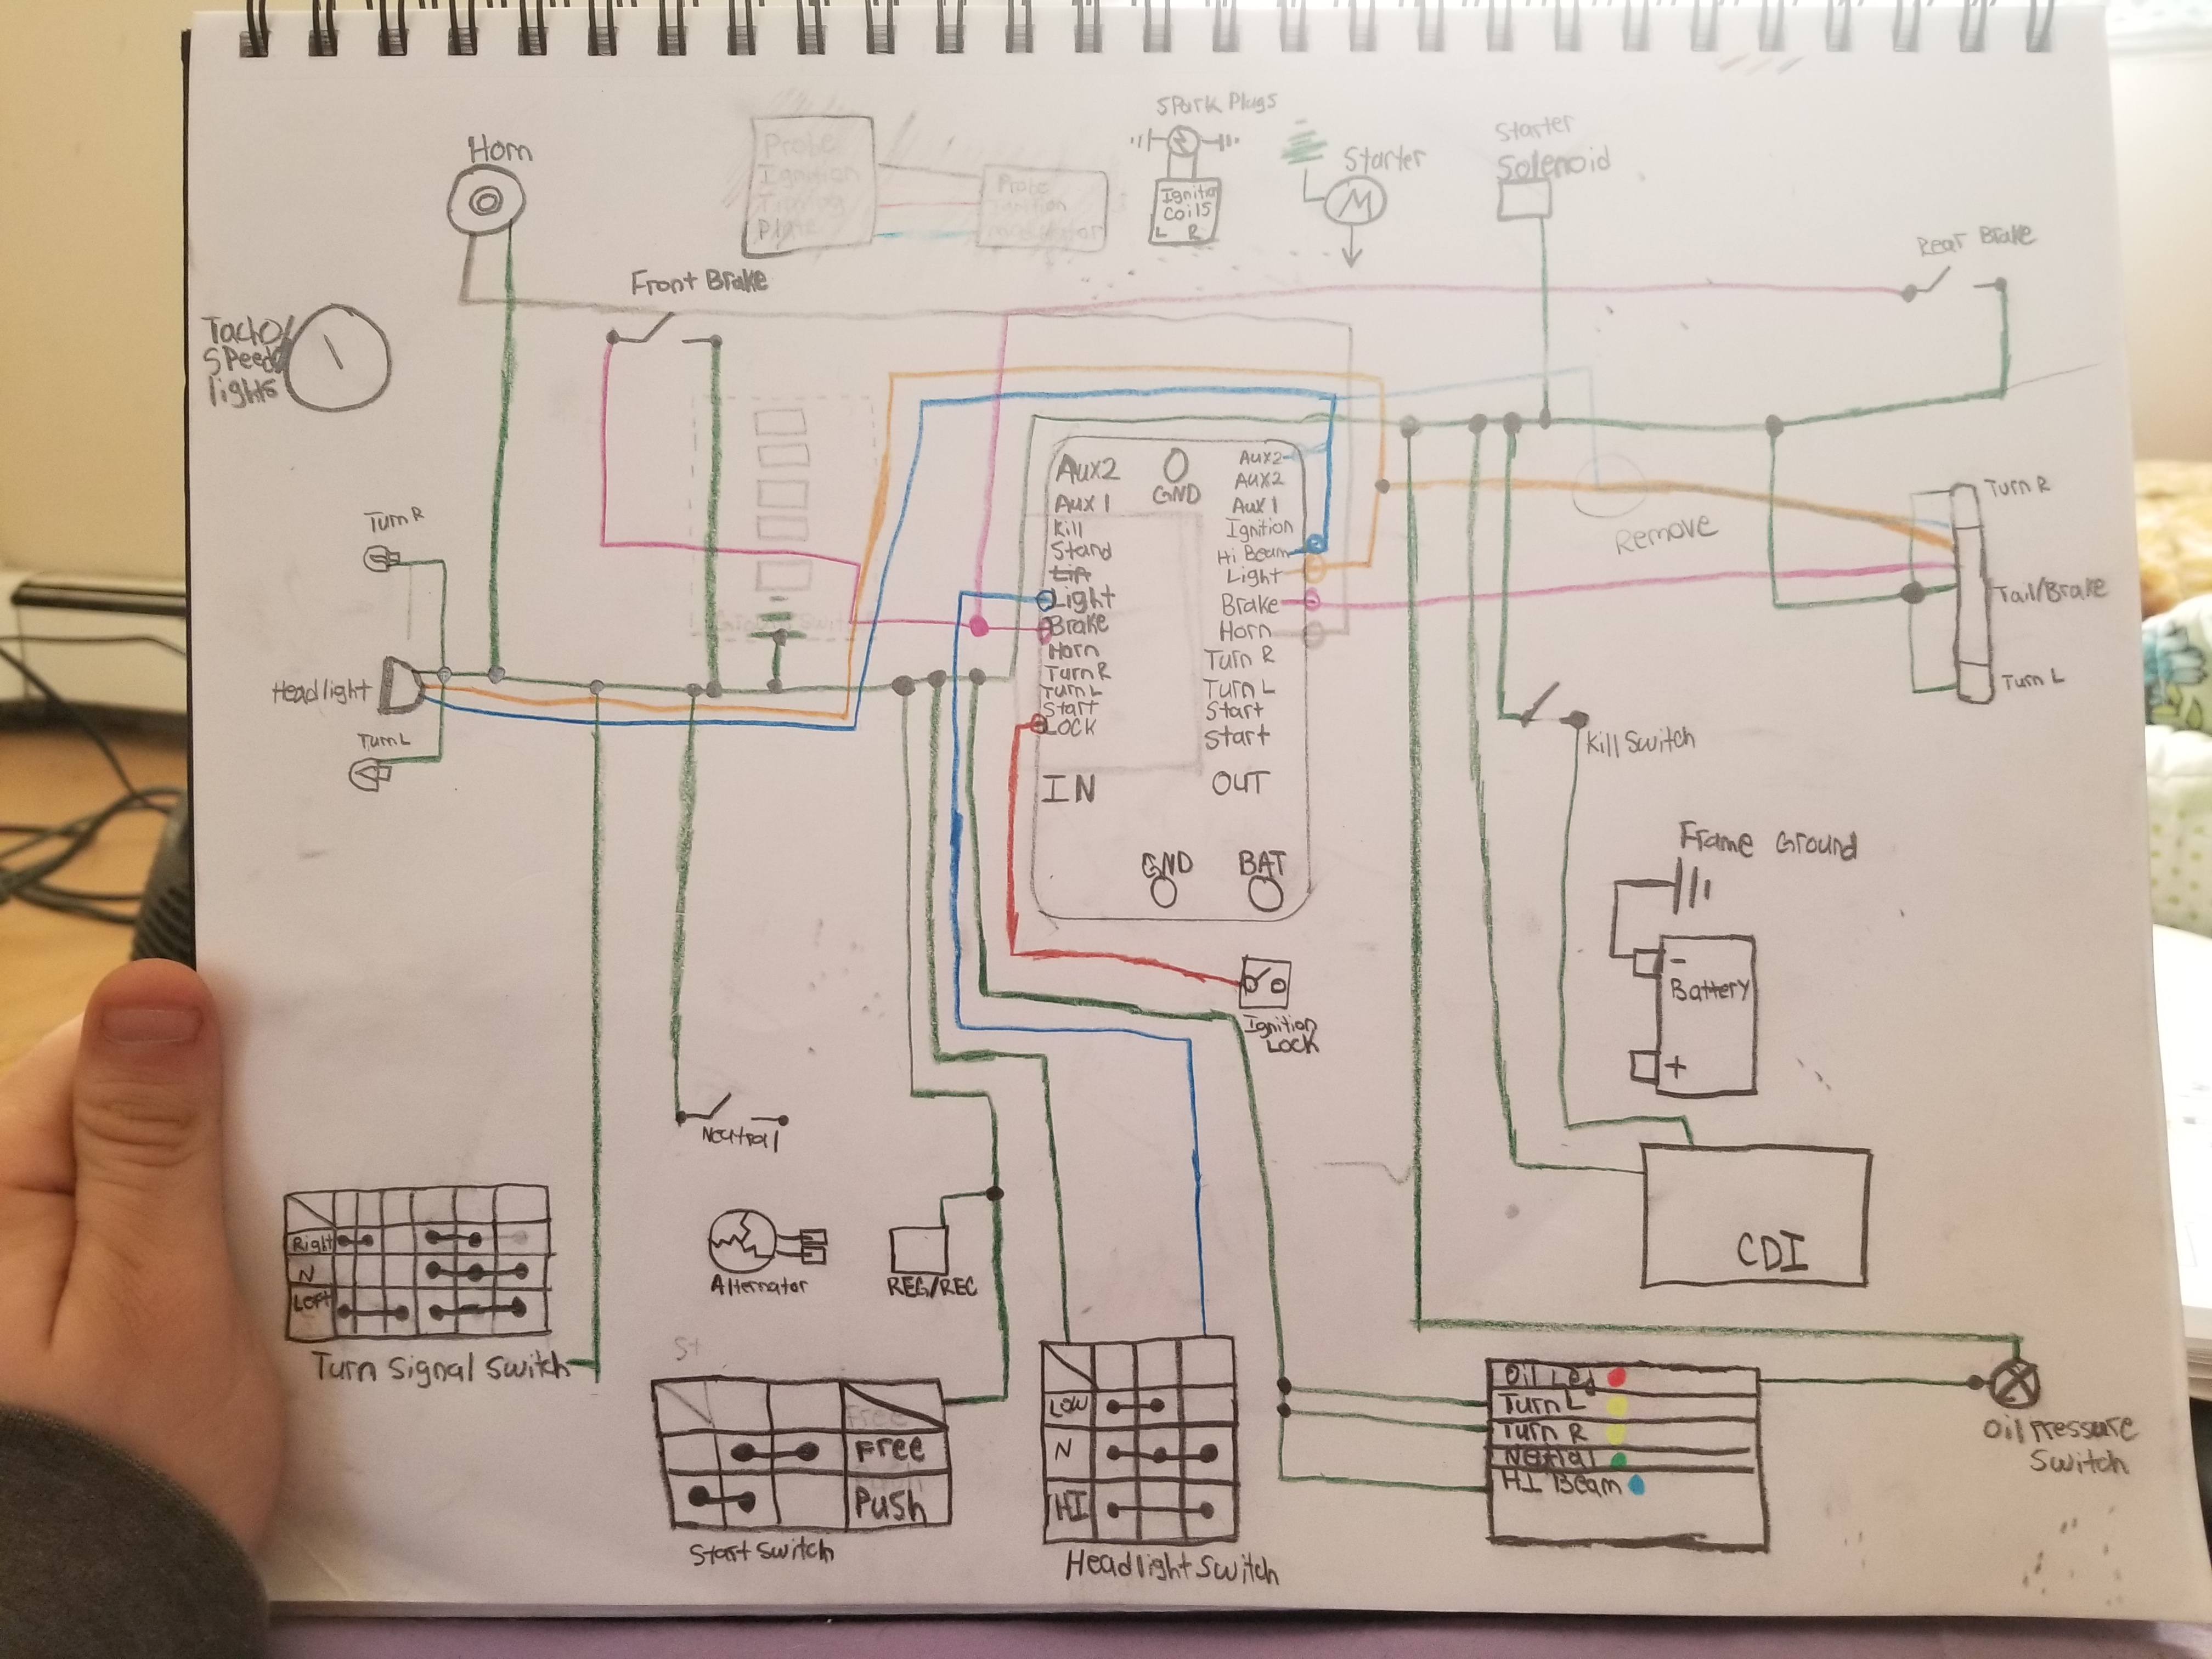 m unit blue cx500 wiring diagram help. Black Bedroom Furniture Sets. Home Design Ideas